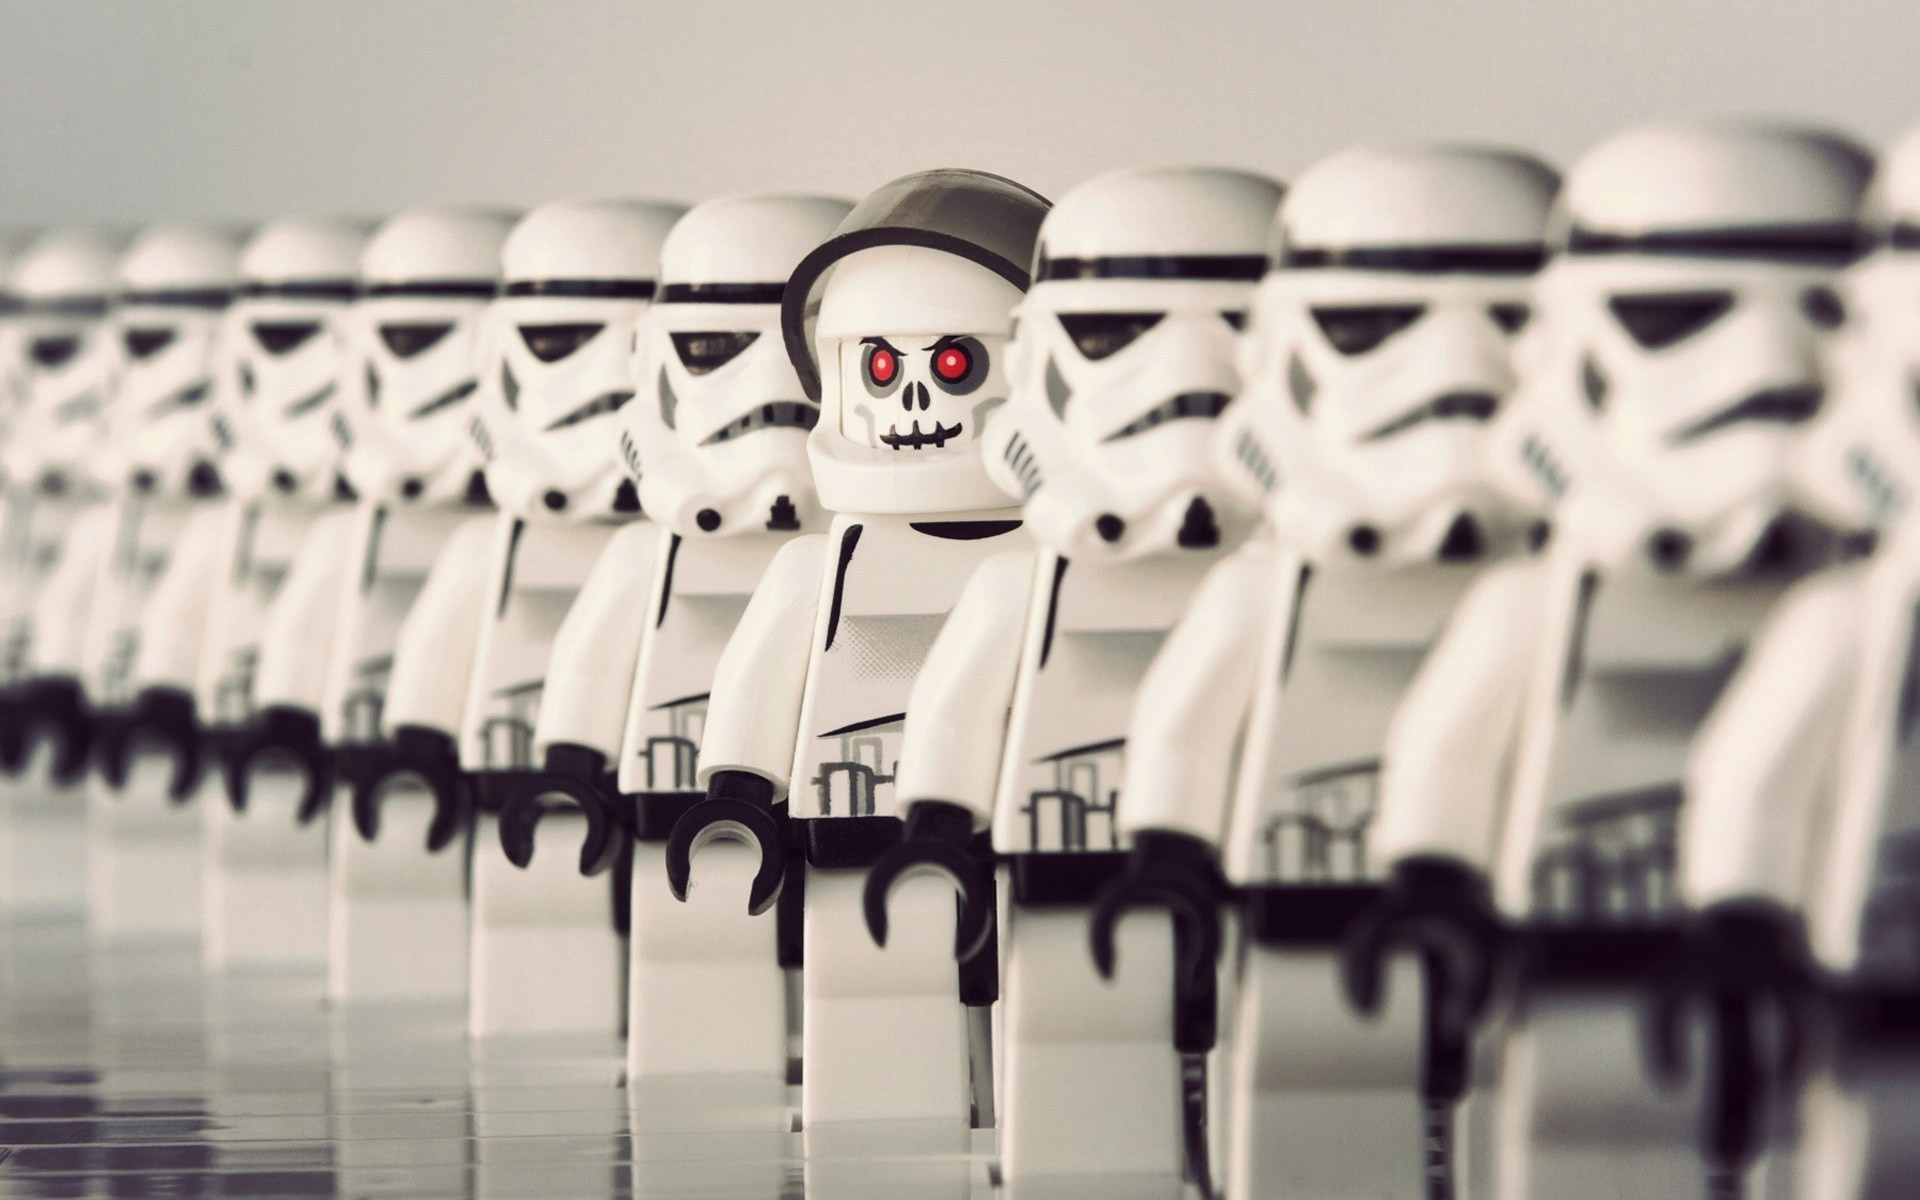 General 1920x1200 LEGO Star Wars stormtrooper humor white LEGO Star Wars toys Star Wars Humor LEGO Stormtrooper